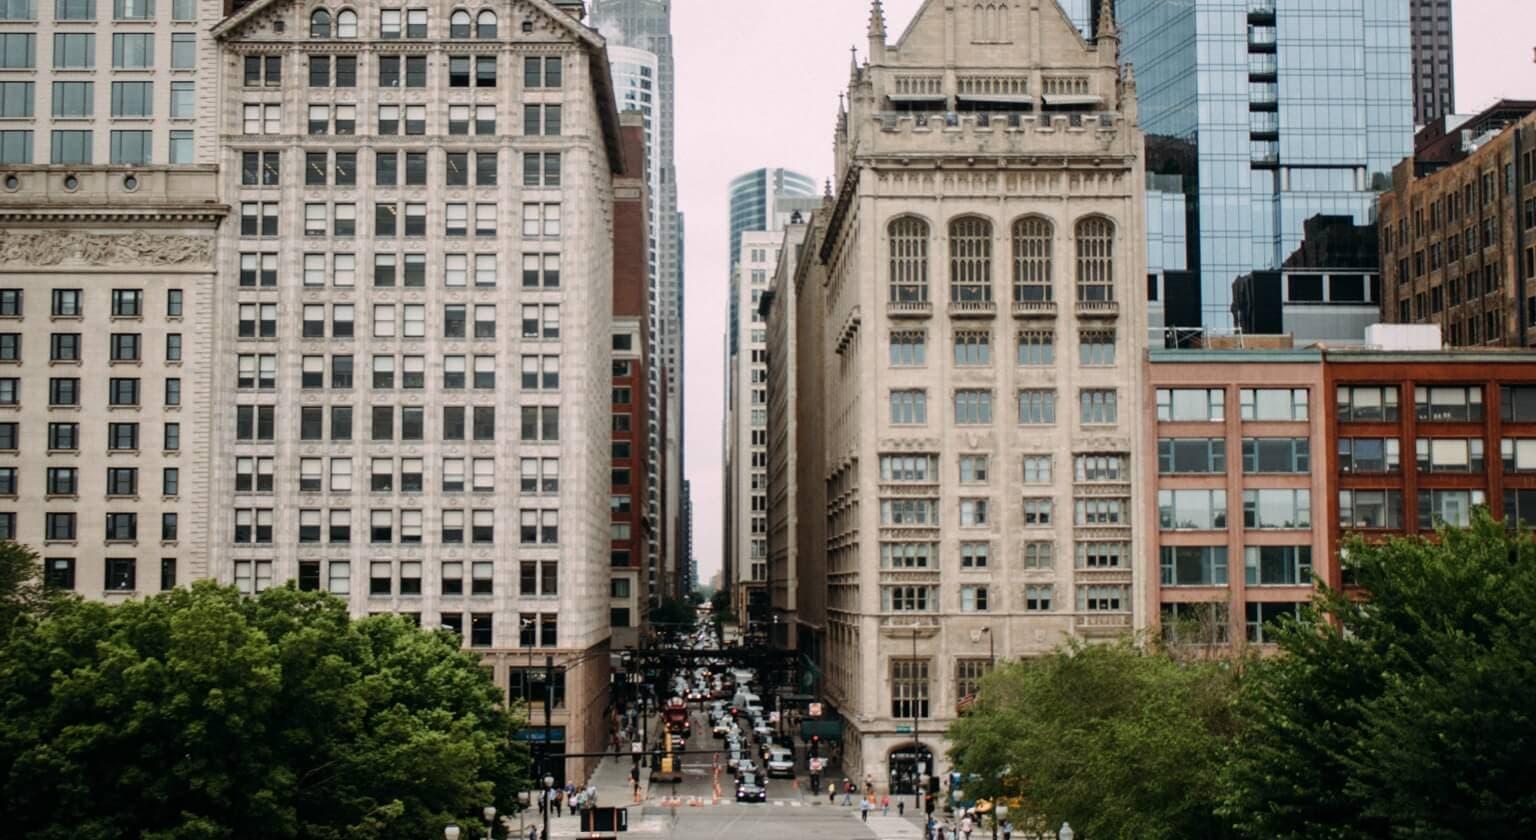 Exotic Luxury Car Rentals In Chicago Il Turo